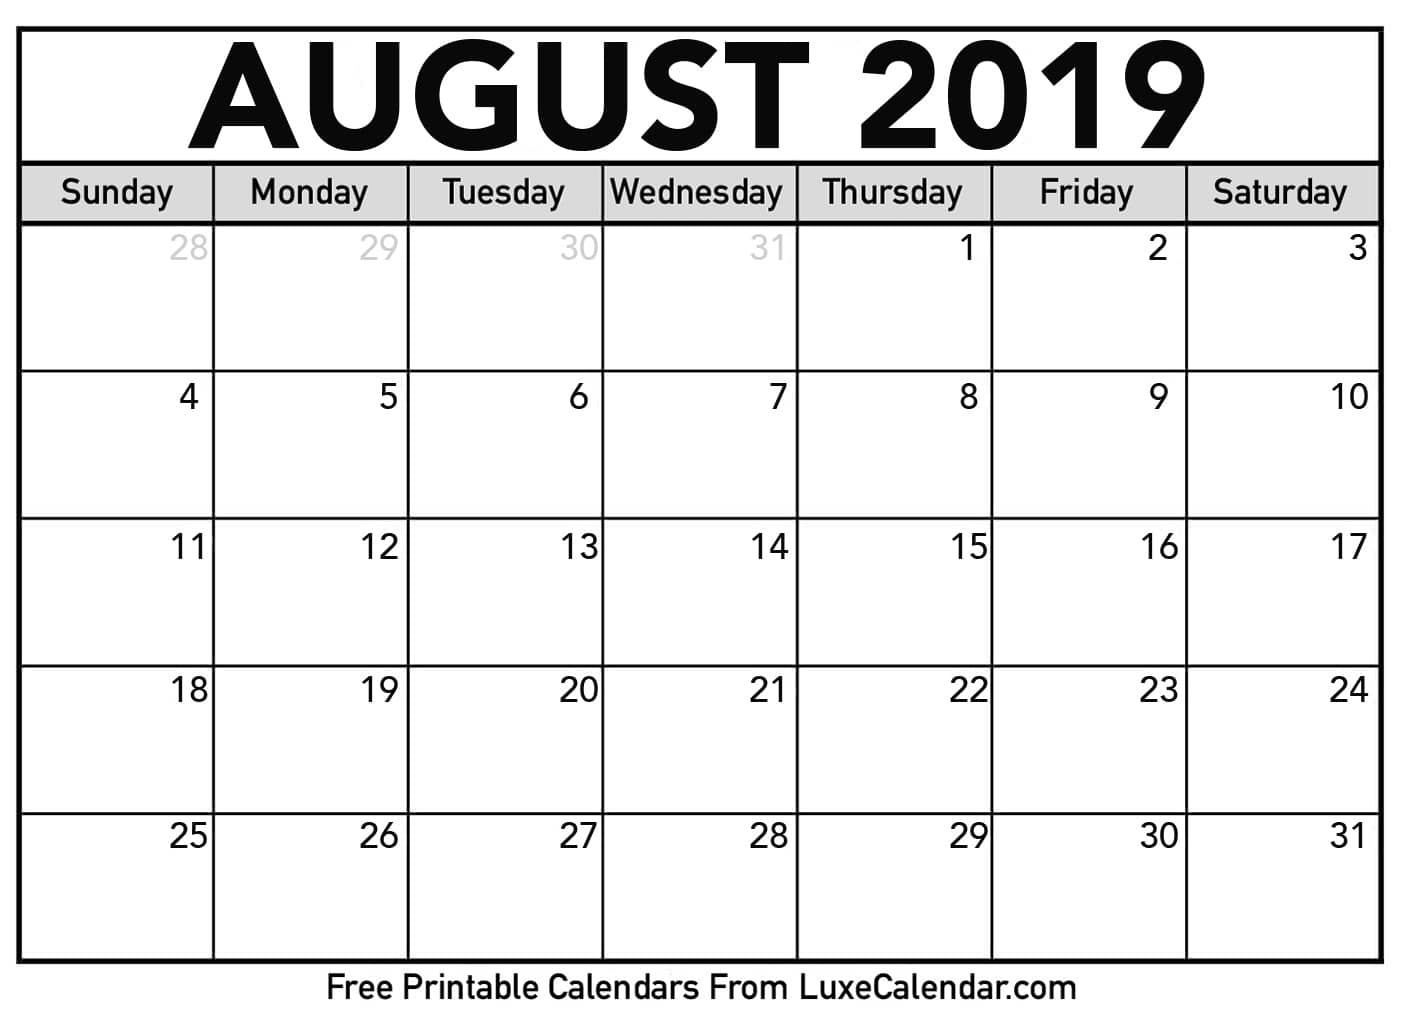 Blank August 2019 Calendar Printable - Luxe Calendar